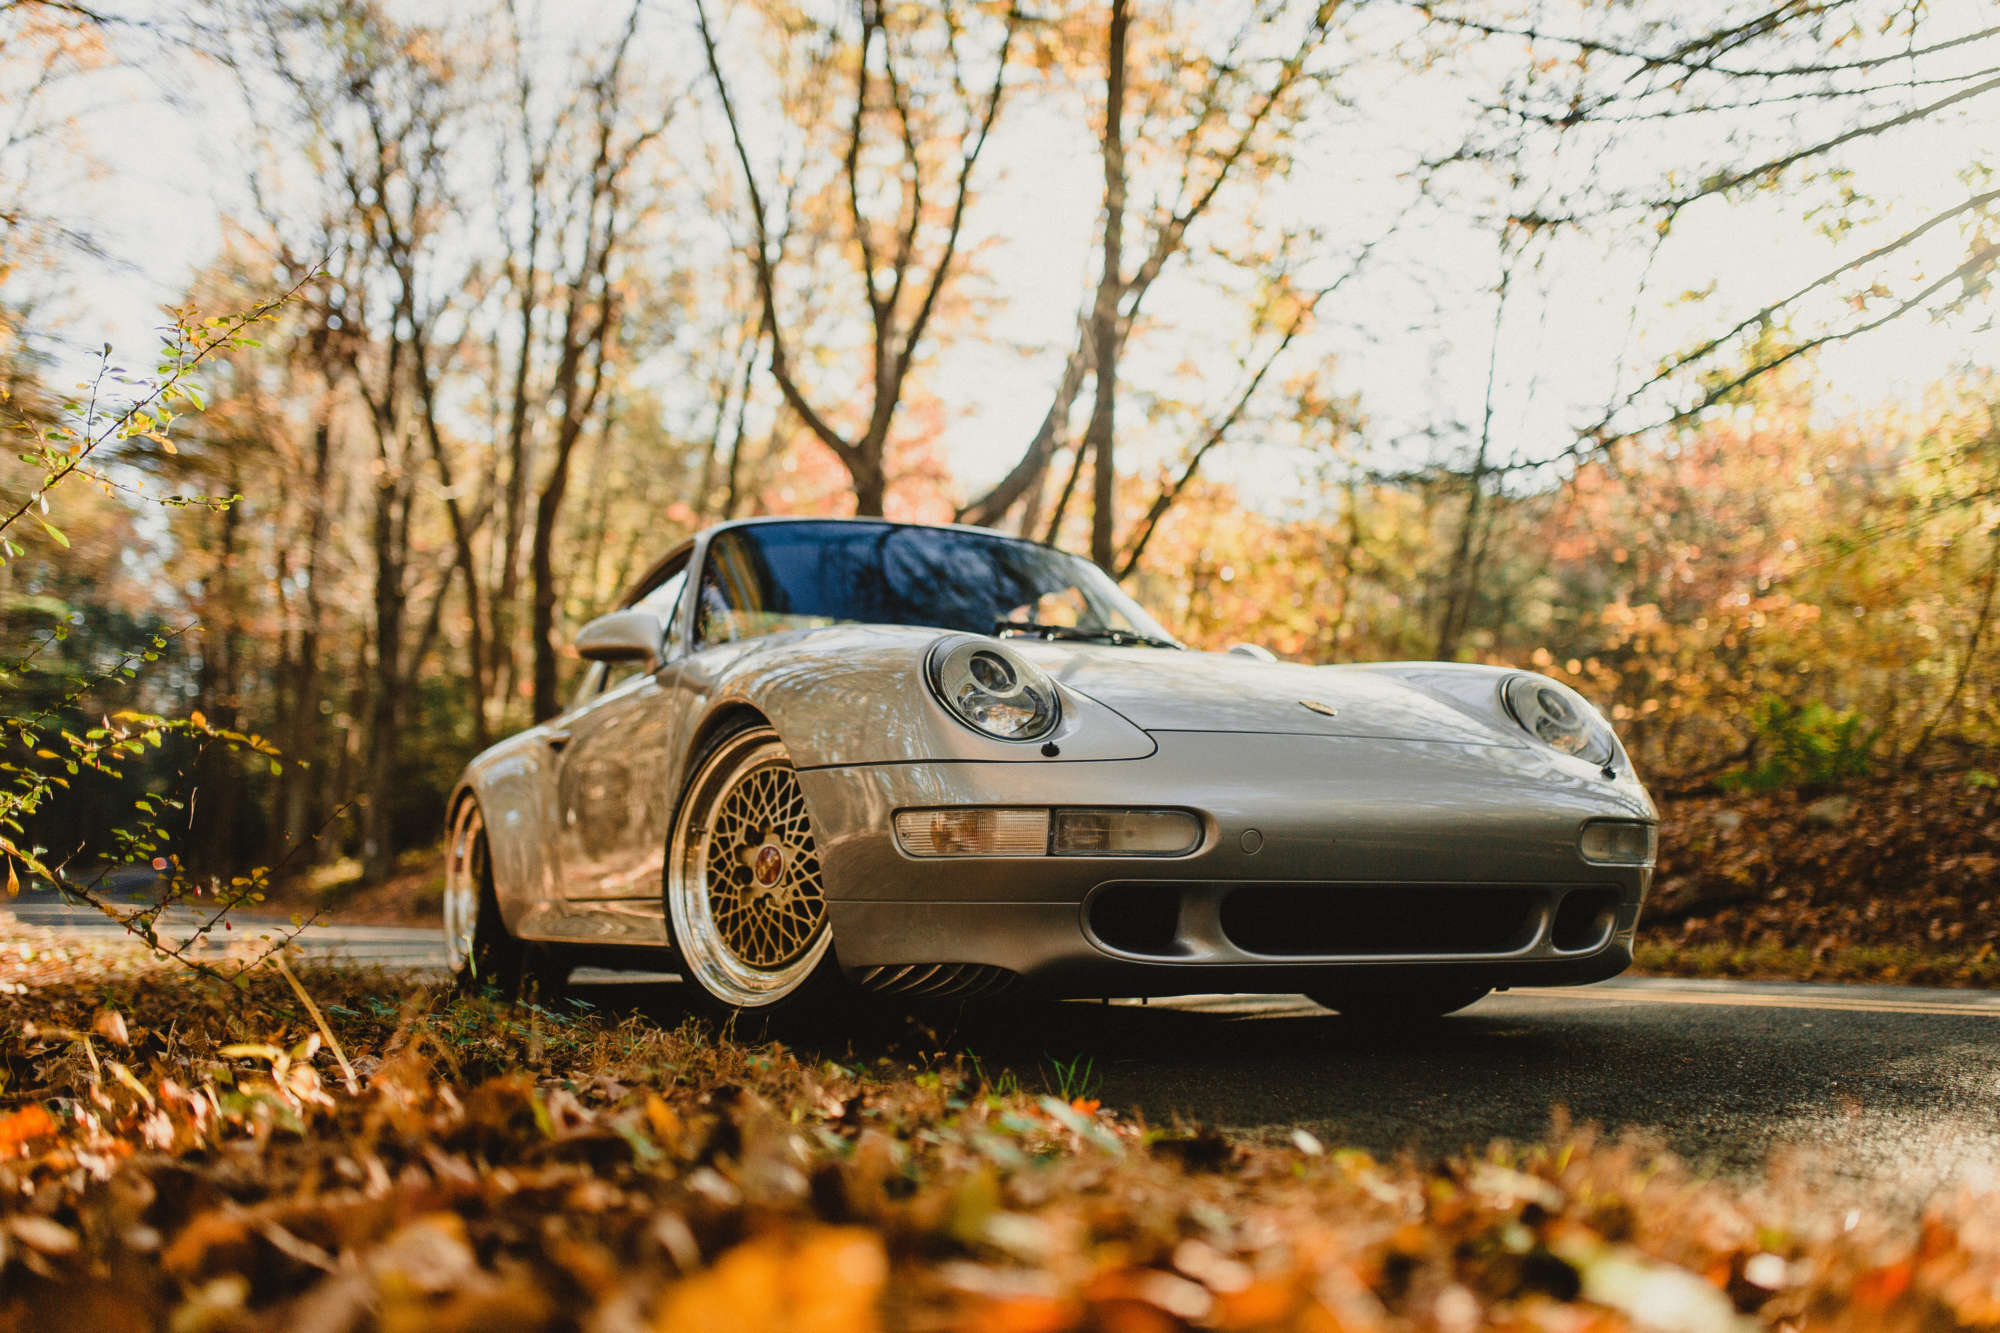 Porsche 911 Carrera S elferspot